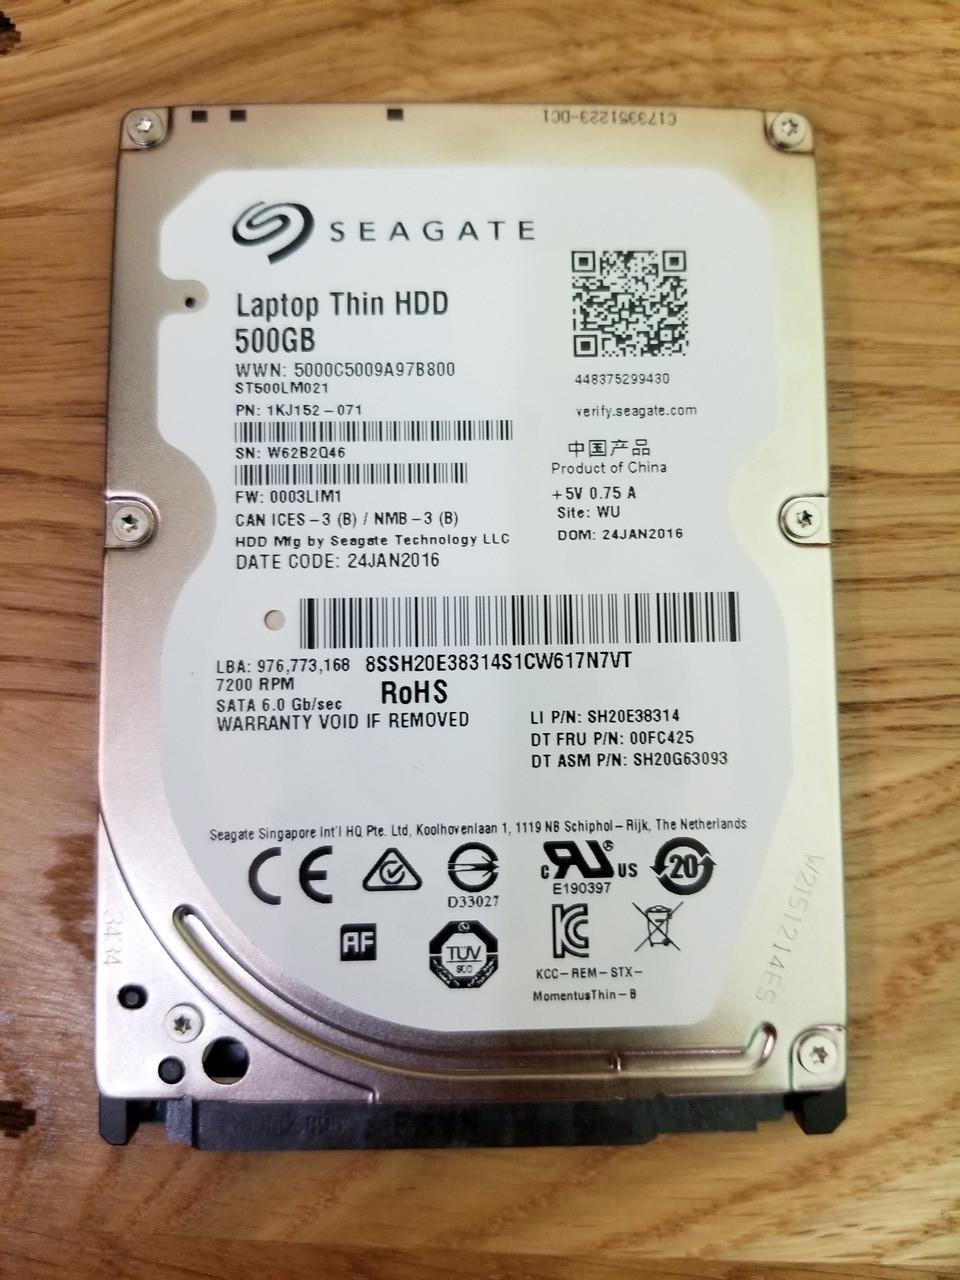 Жорстку диск для ноутбука Seagate Laptop Thin HDD 500GB 7200rpm 32MB ST500LM021 2.5 SATA III